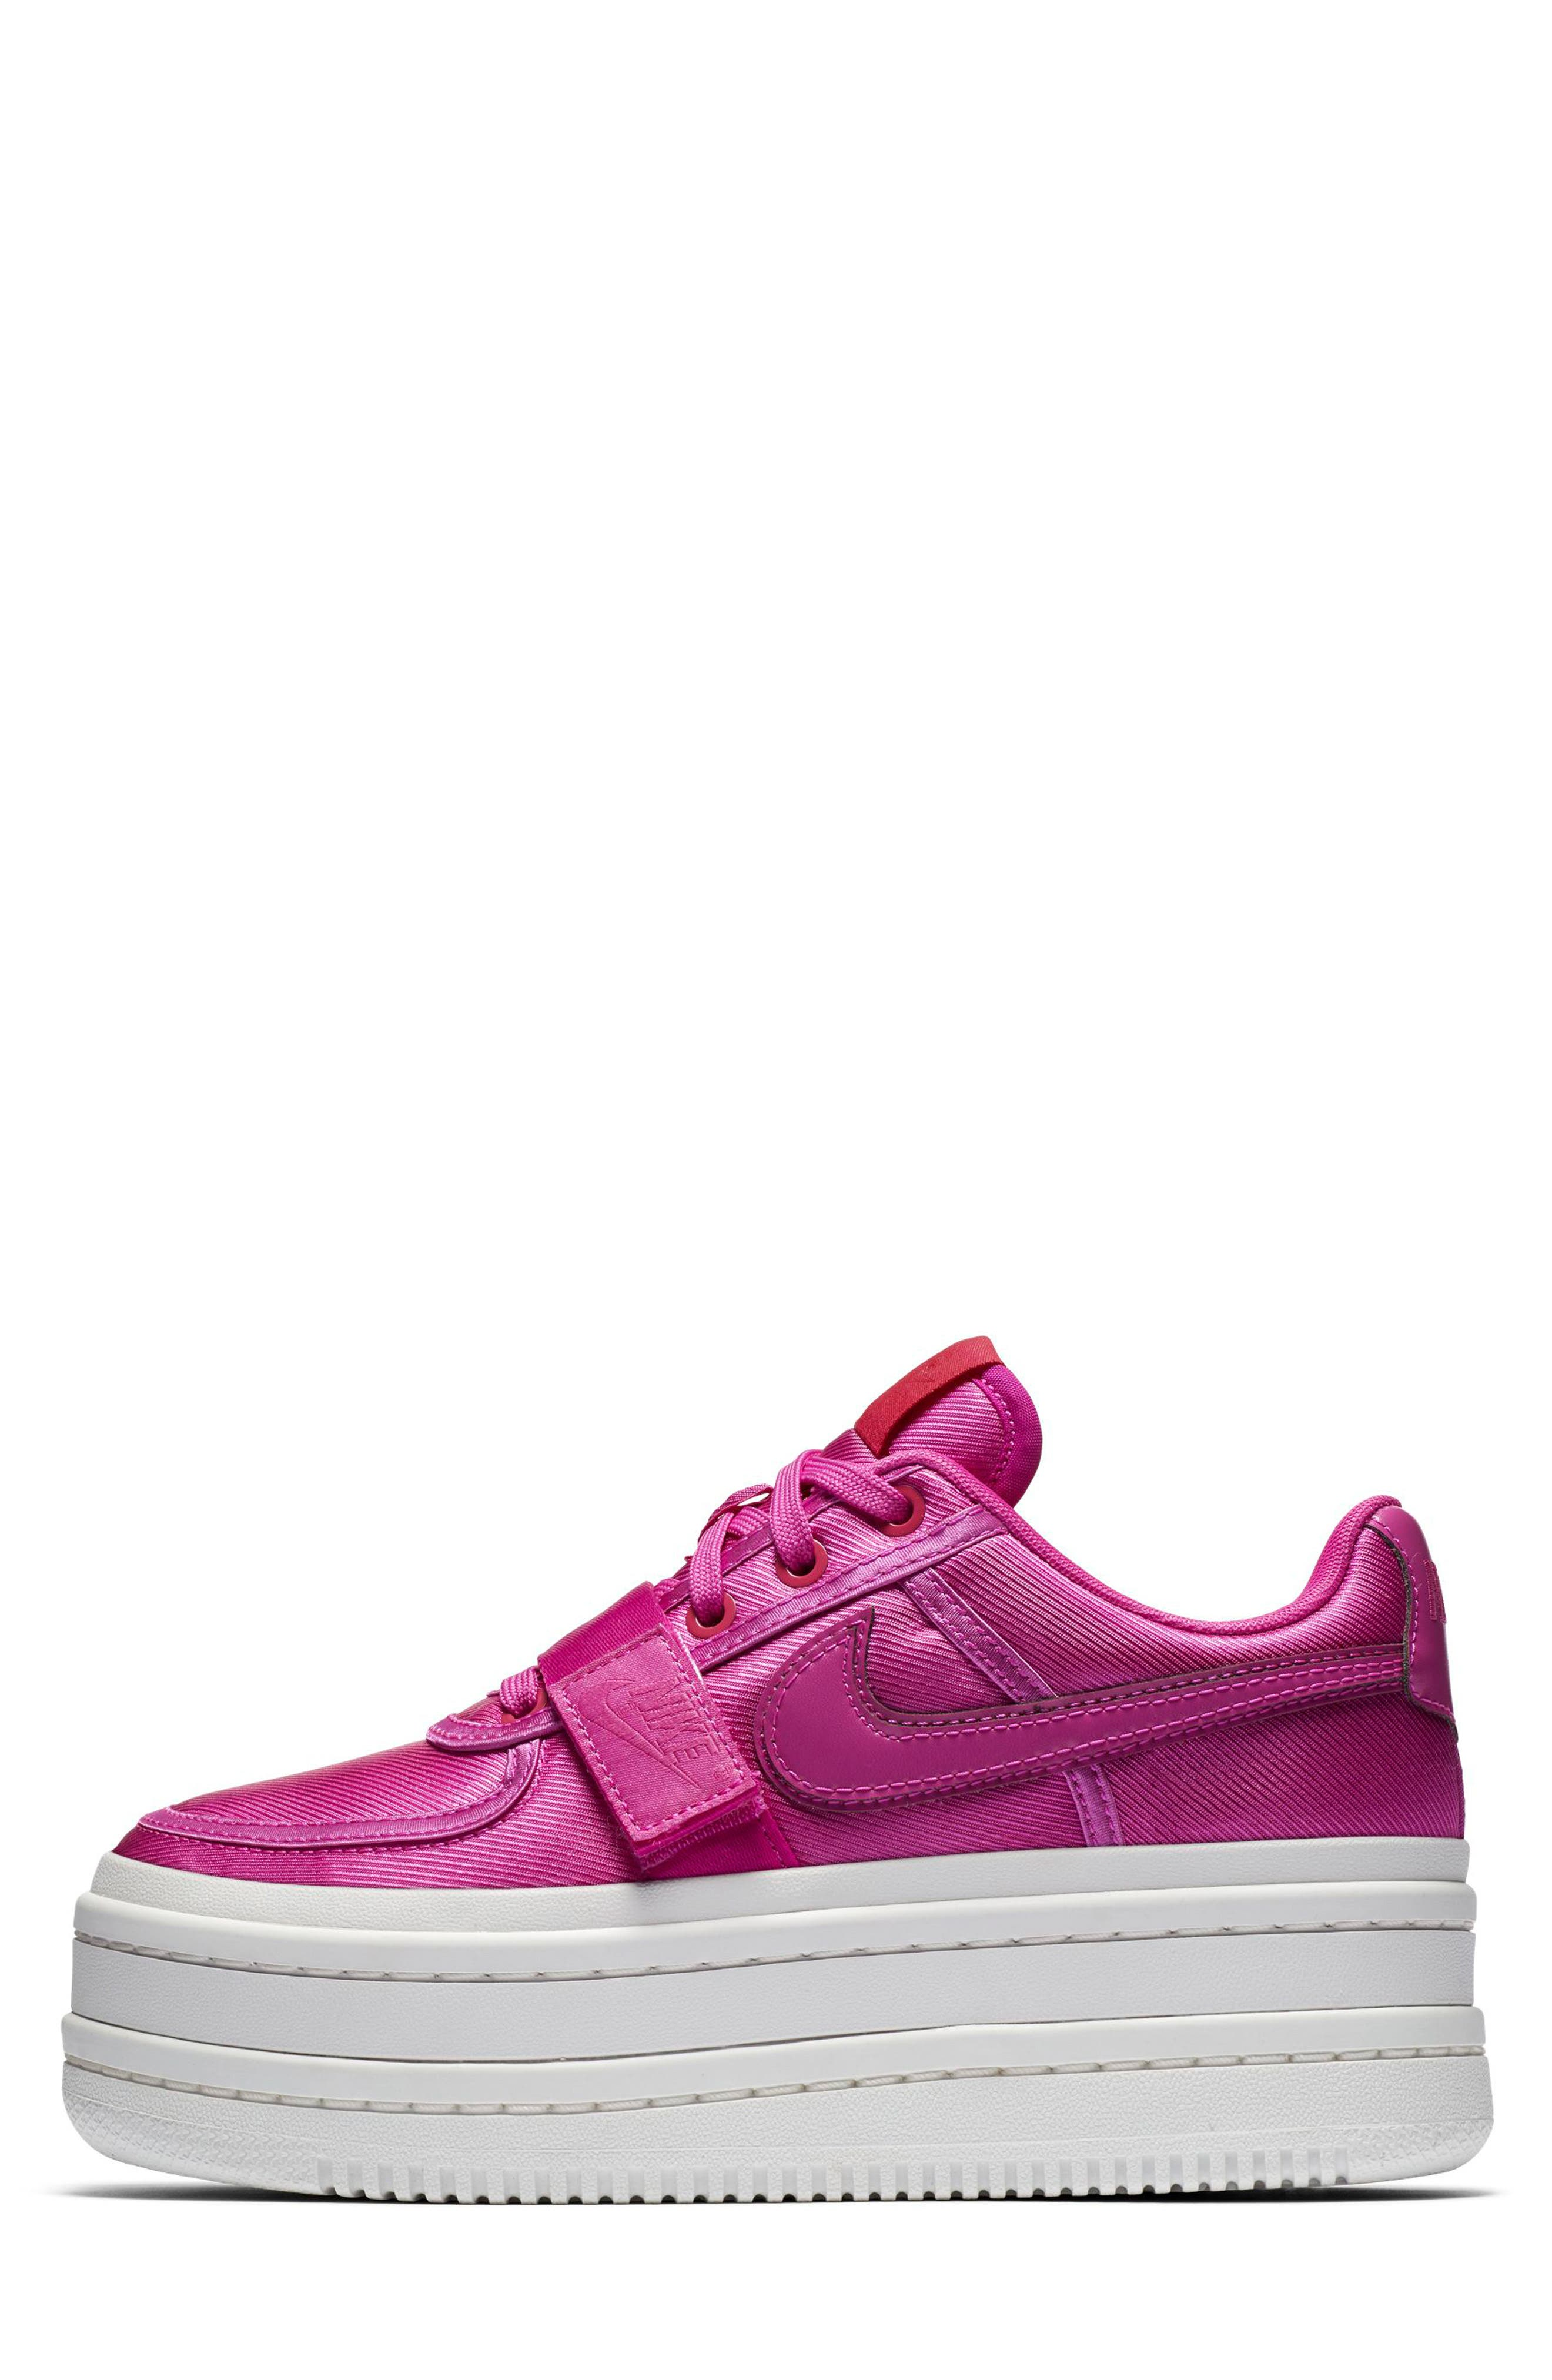 Vandal 2K Sneaker,                             Alternate thumbnail 3, color,                             HYPER MAGENTA/ SUMMIT/ FUCHSIA